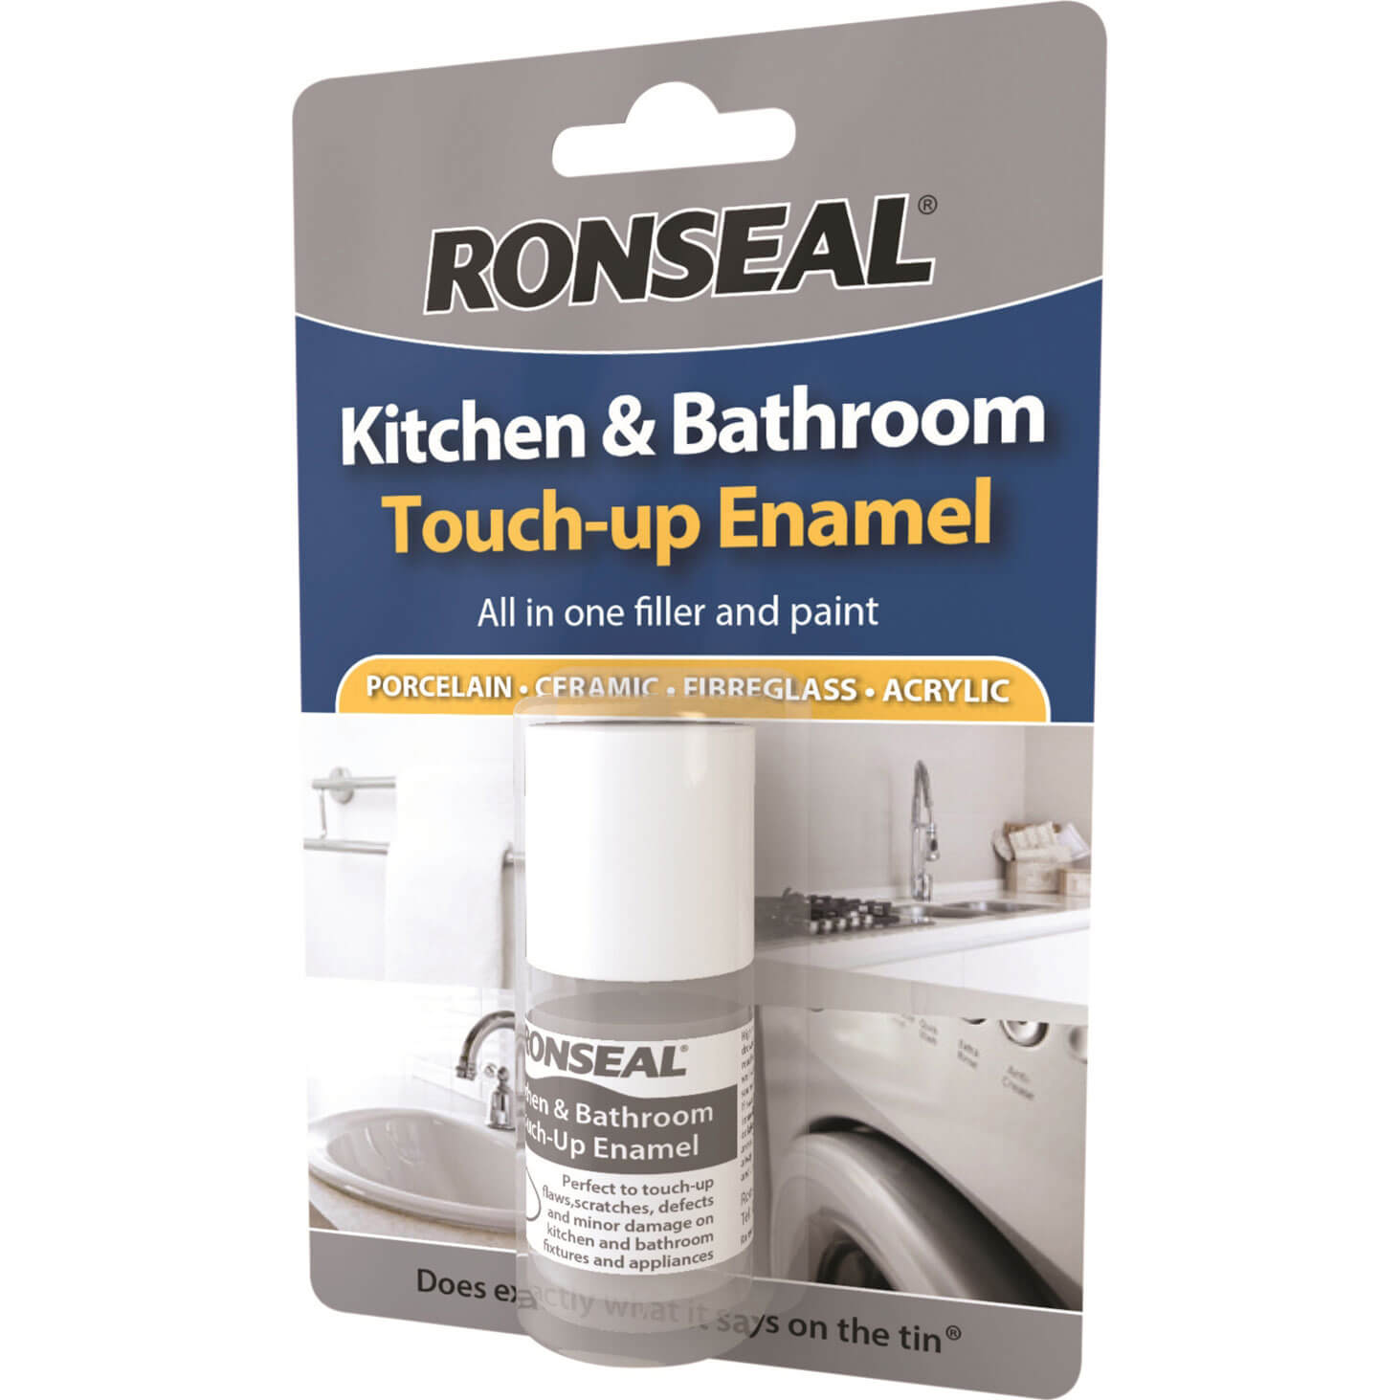 Ronseal kitchen bathroom touch up enamel paint for Bath enamel paint